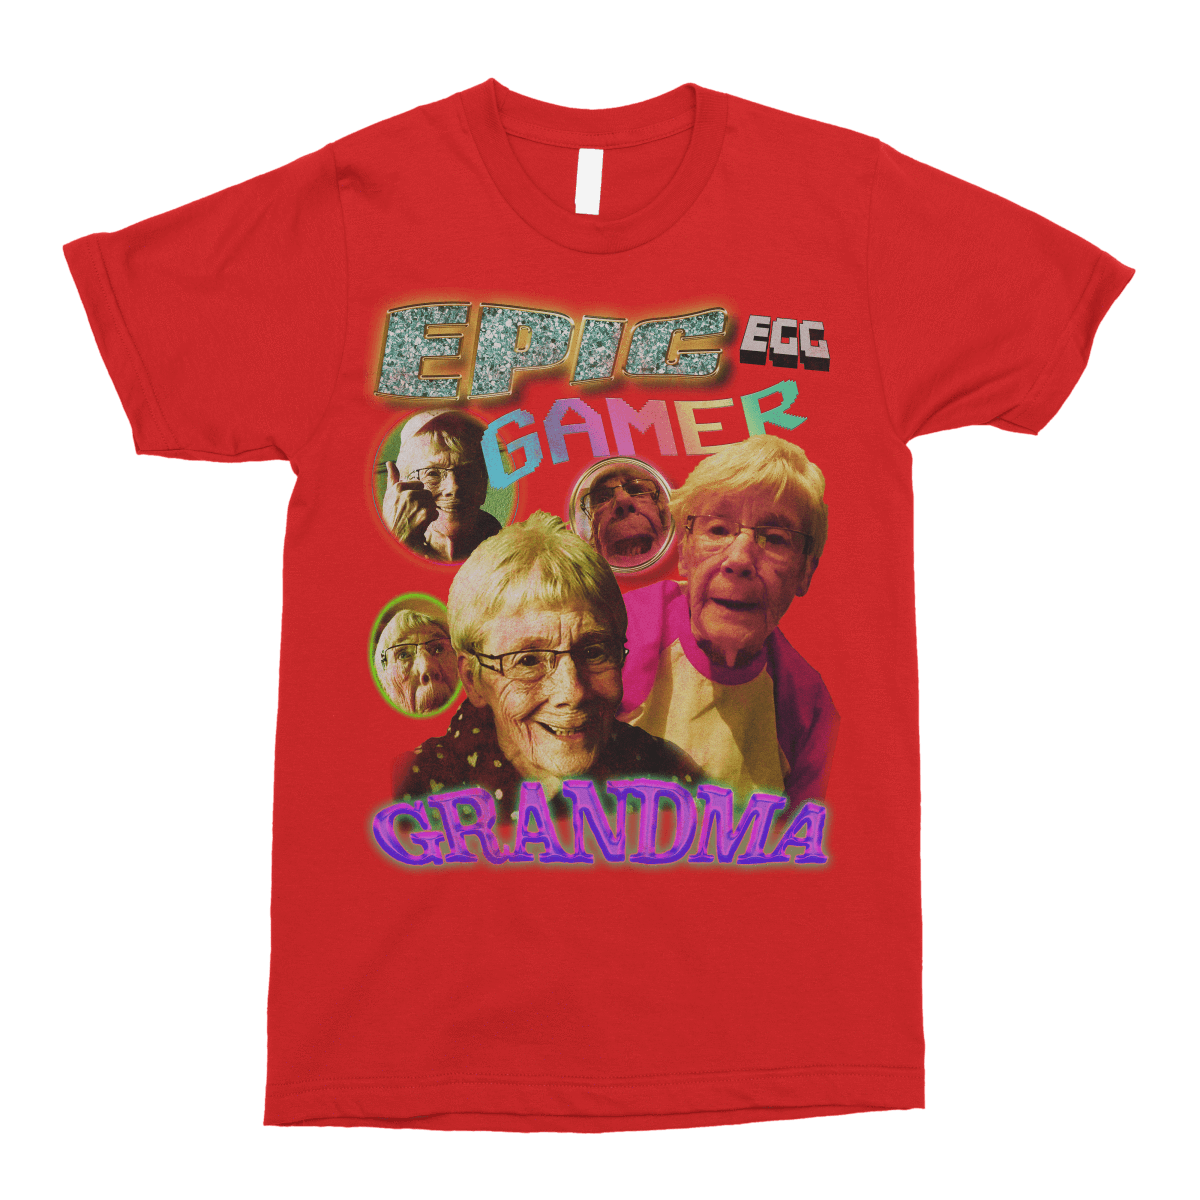 Epic Gamer Grandma - Vintage Bootleg Unisex T-Shirt